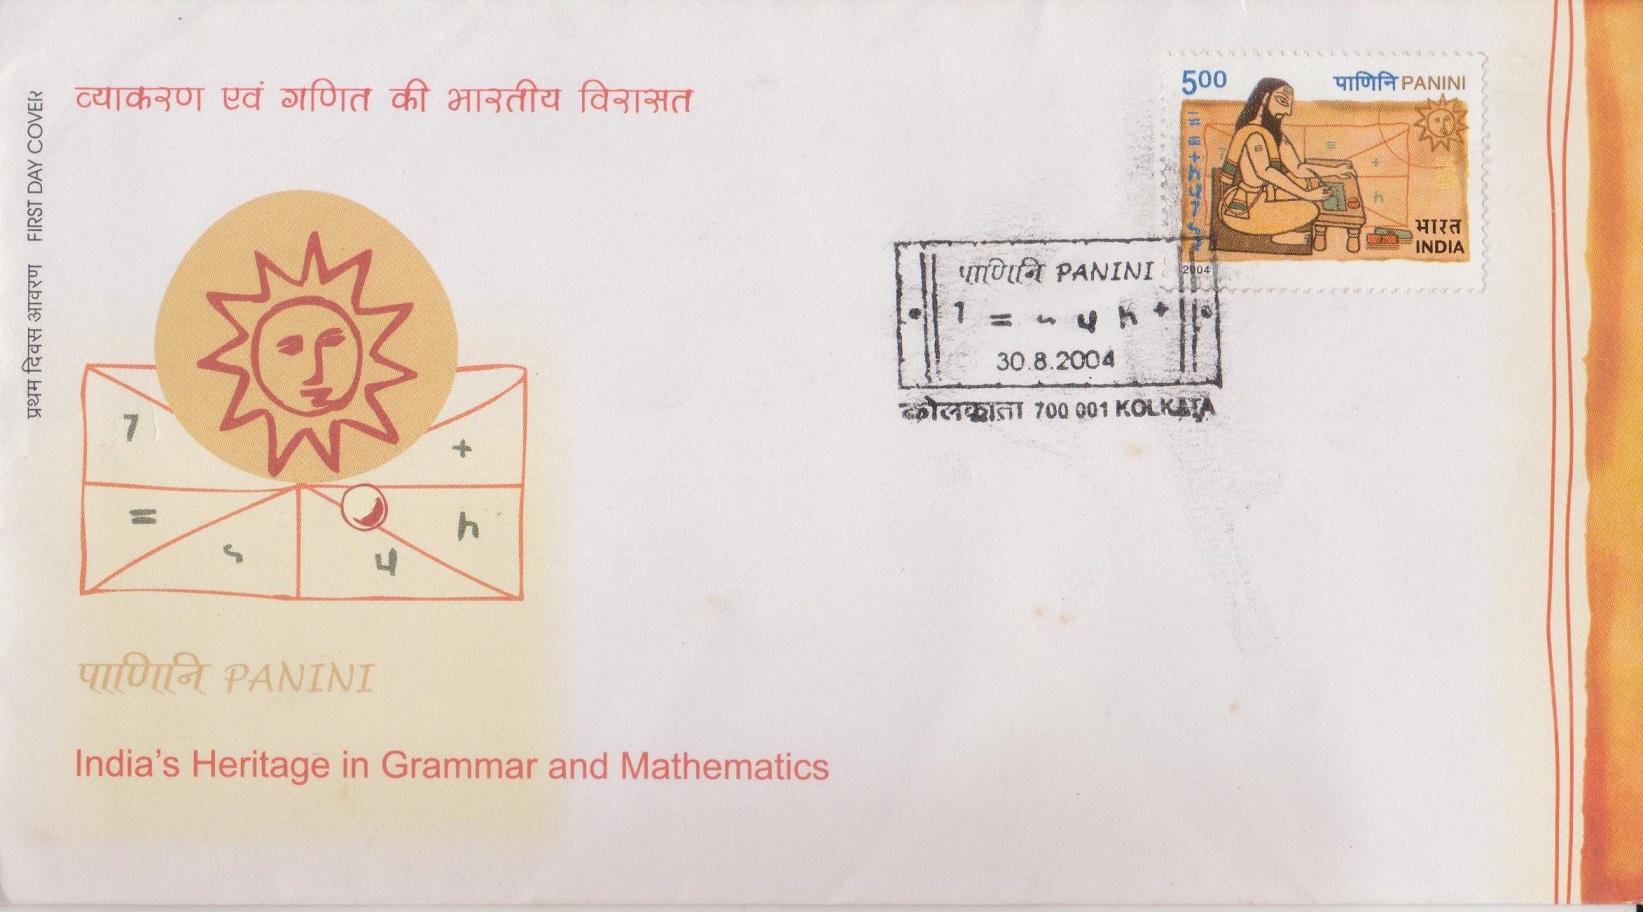 India's Heritage in Grammar and Mathematics